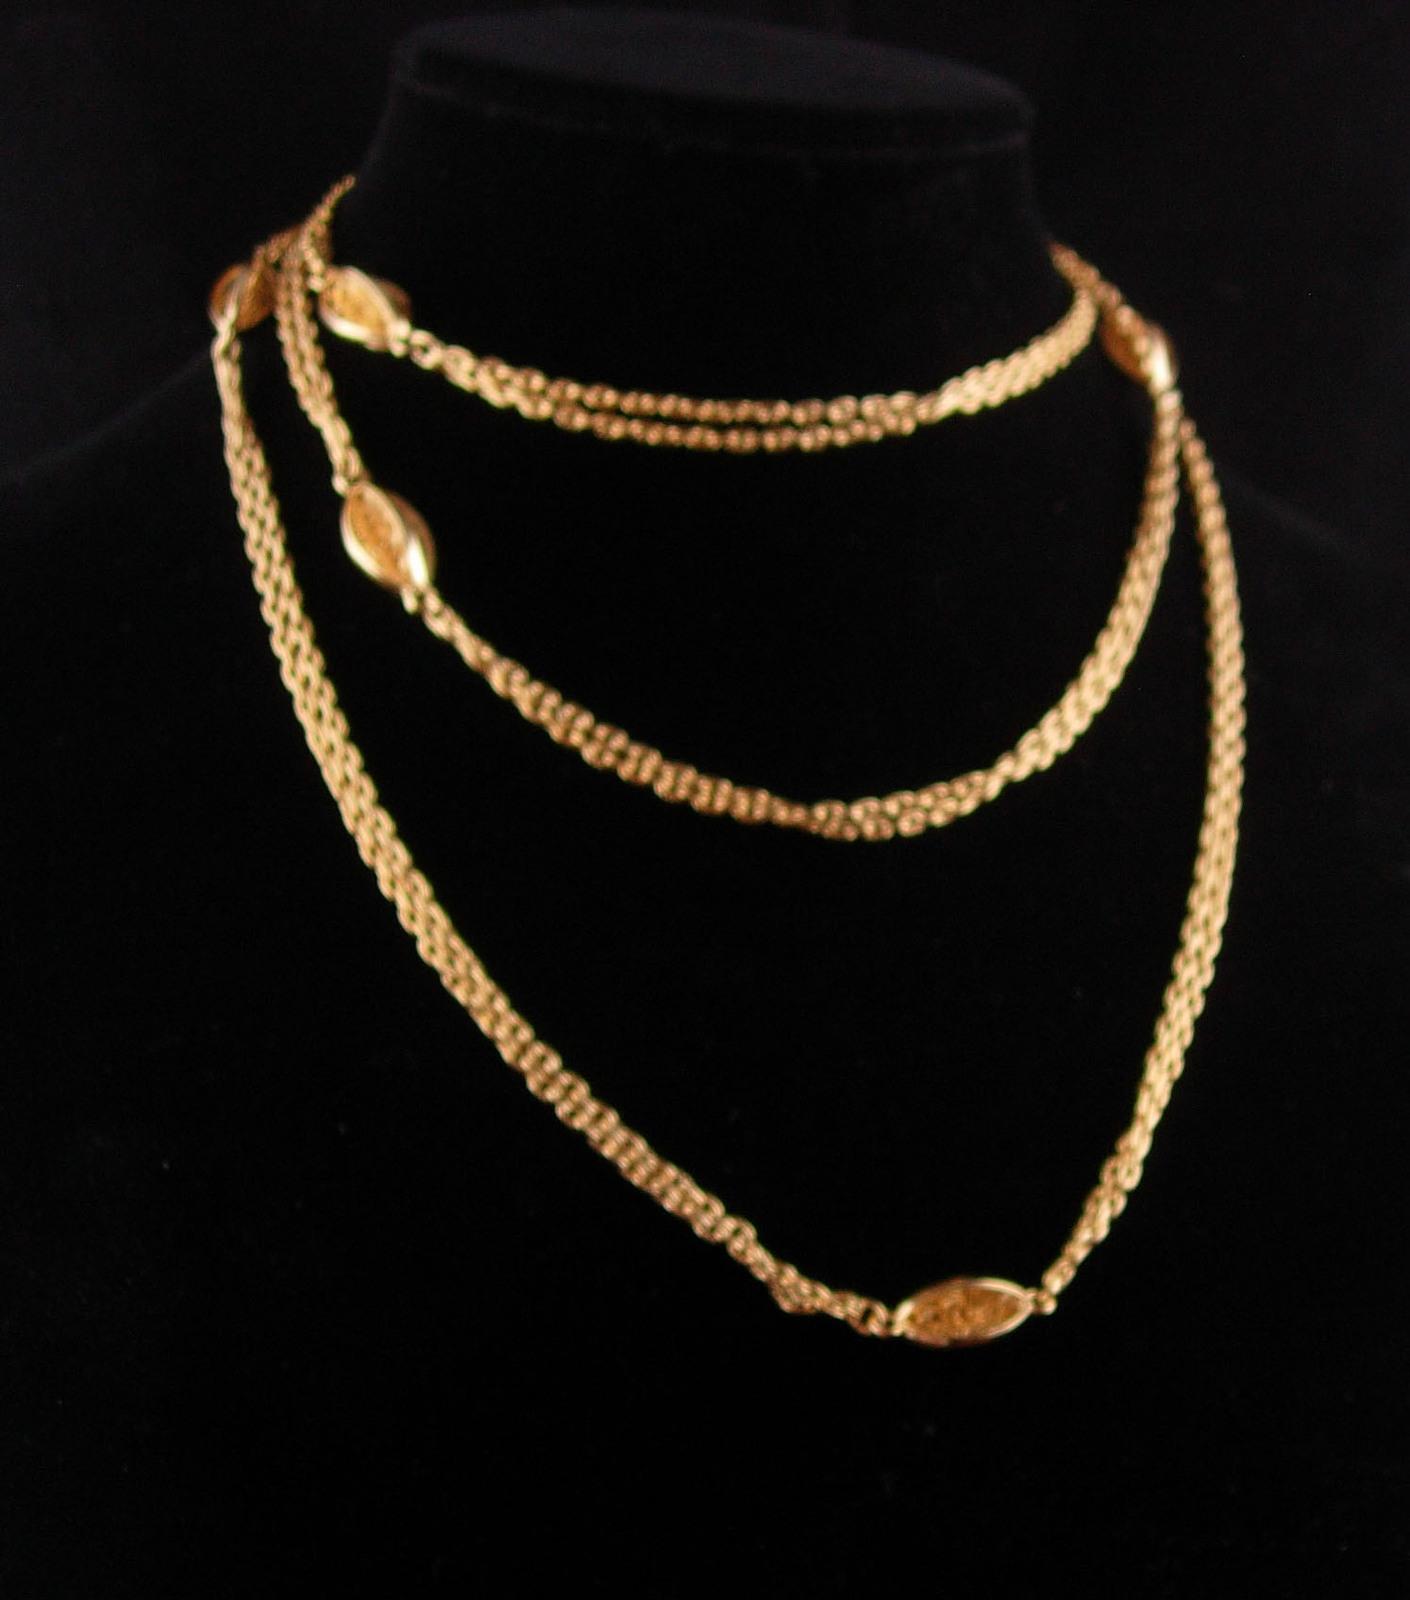 "50"" Monet  necklace - Monet double gold chain - vintage designer jewelry"